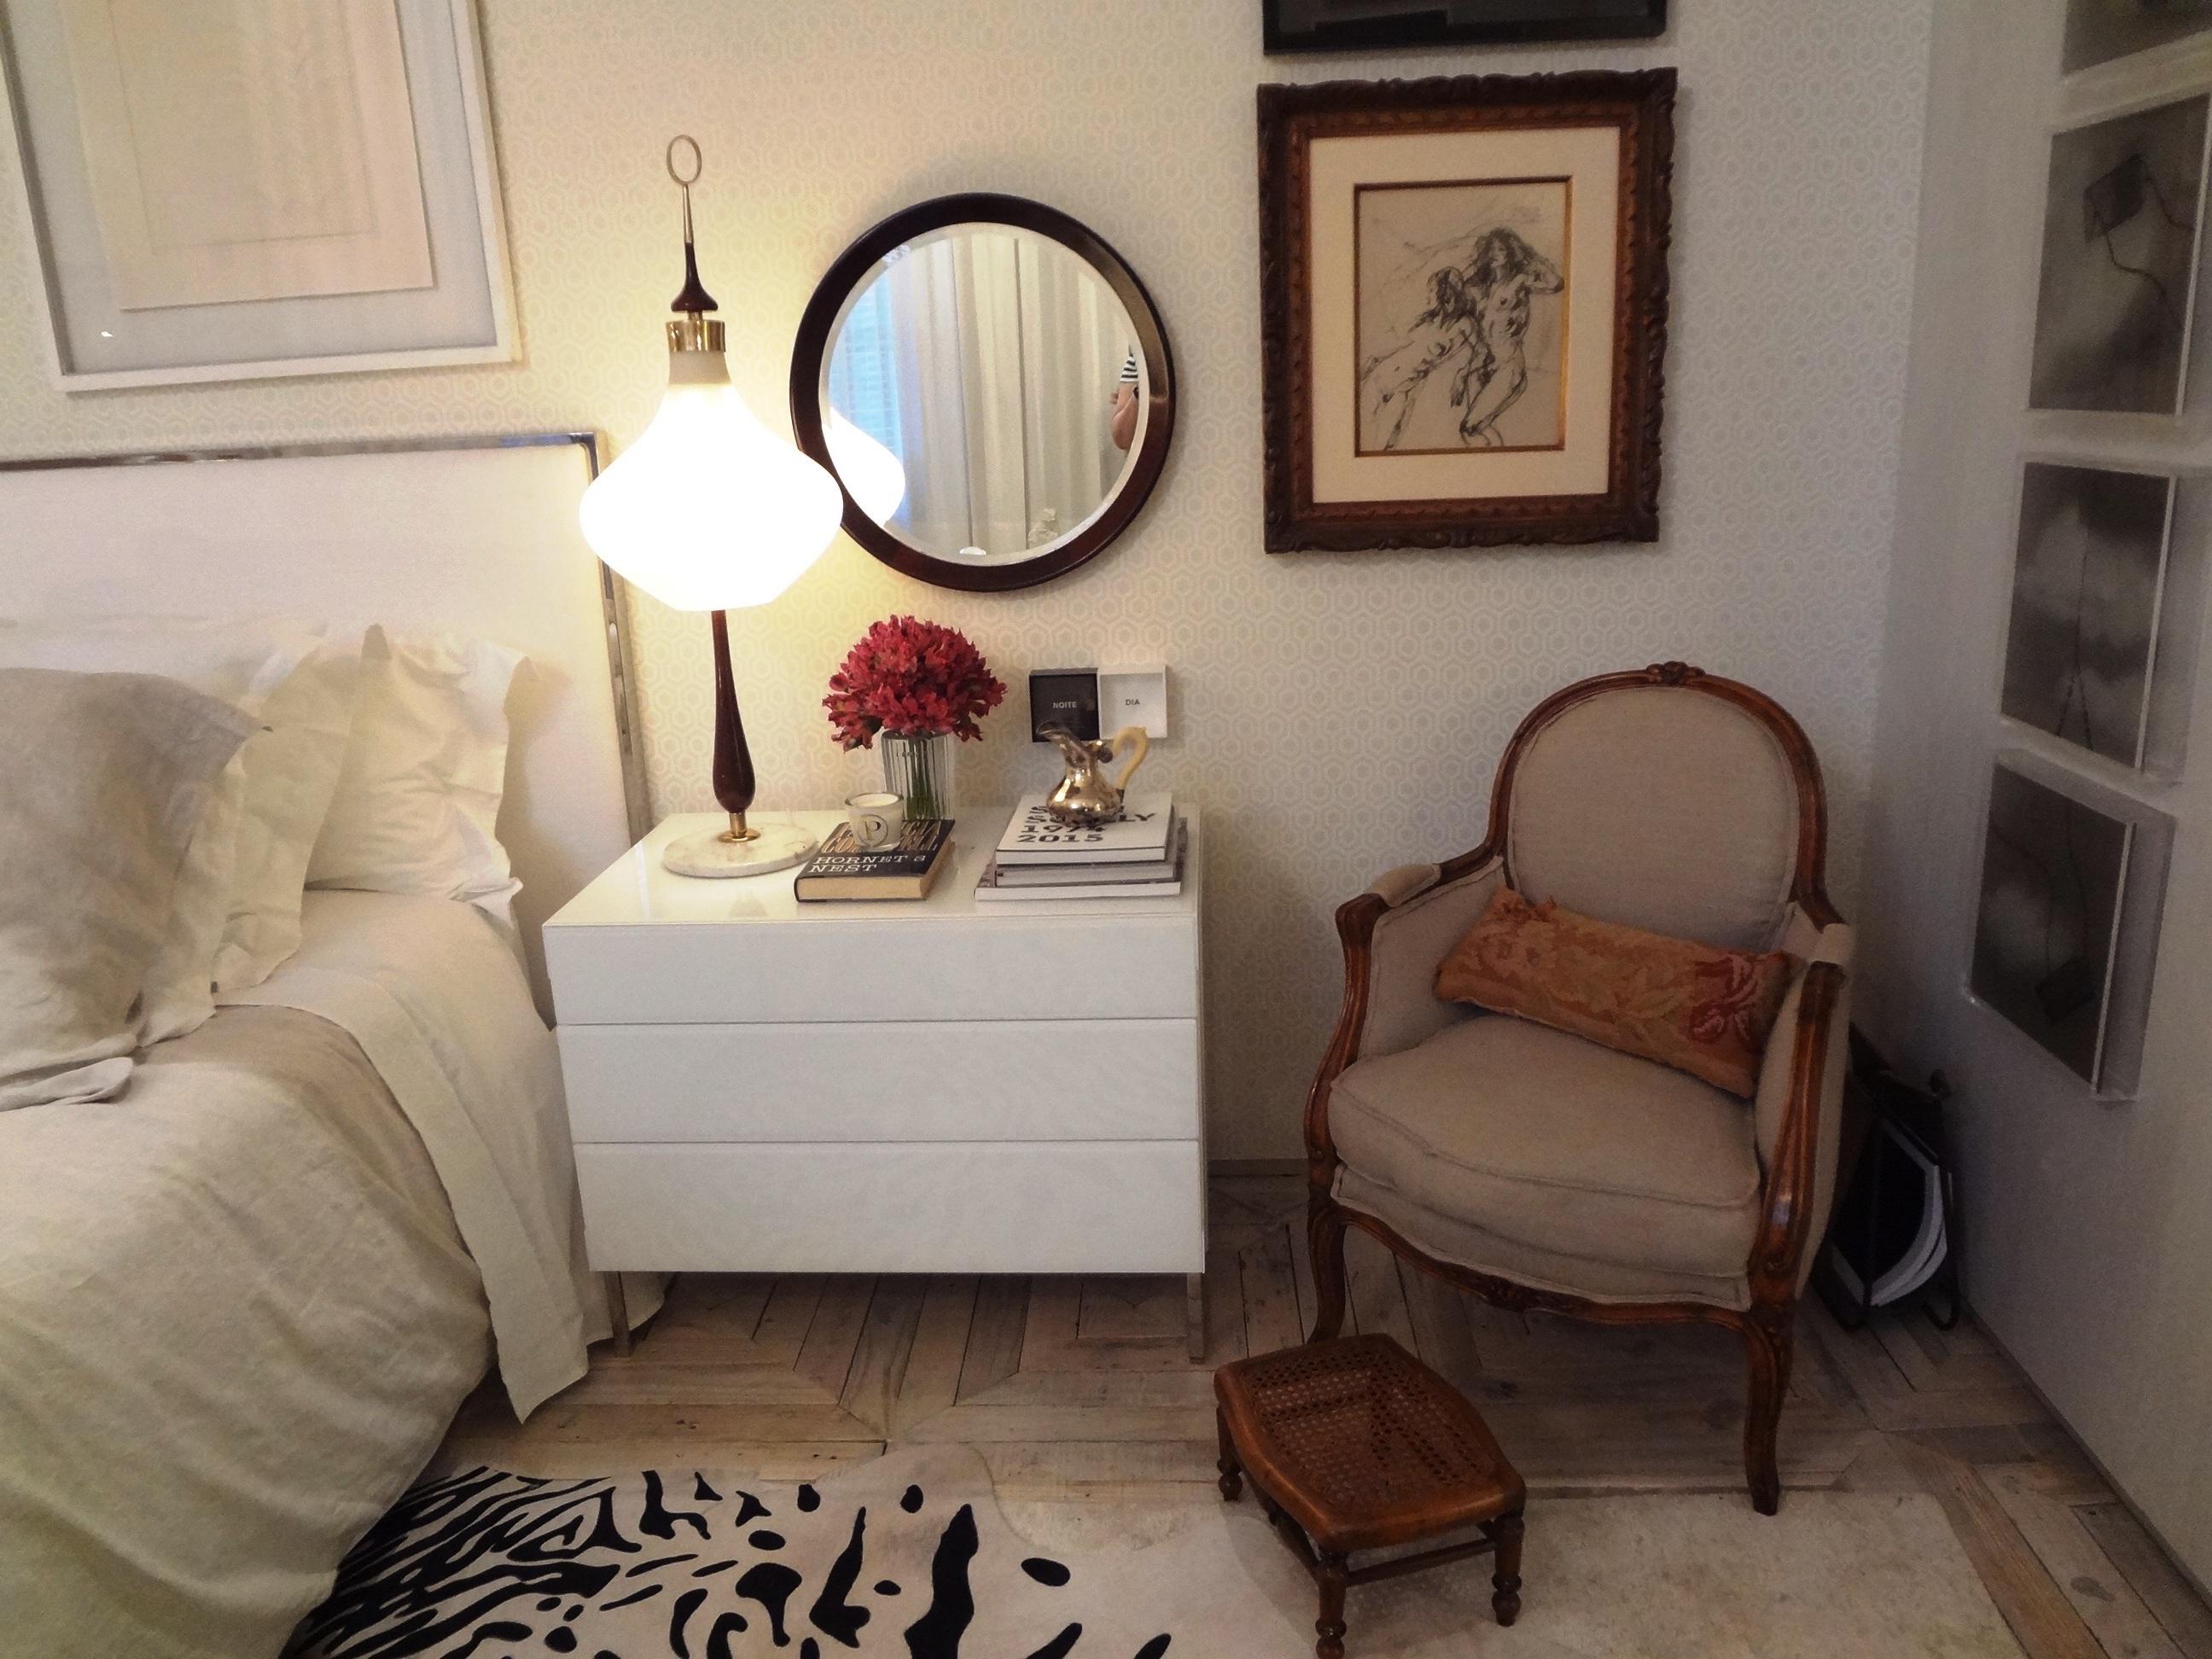 Floor Home Decoration Cottage Property Living Room Furniture Bedroom Apartment Interior Design Estate Suite Real